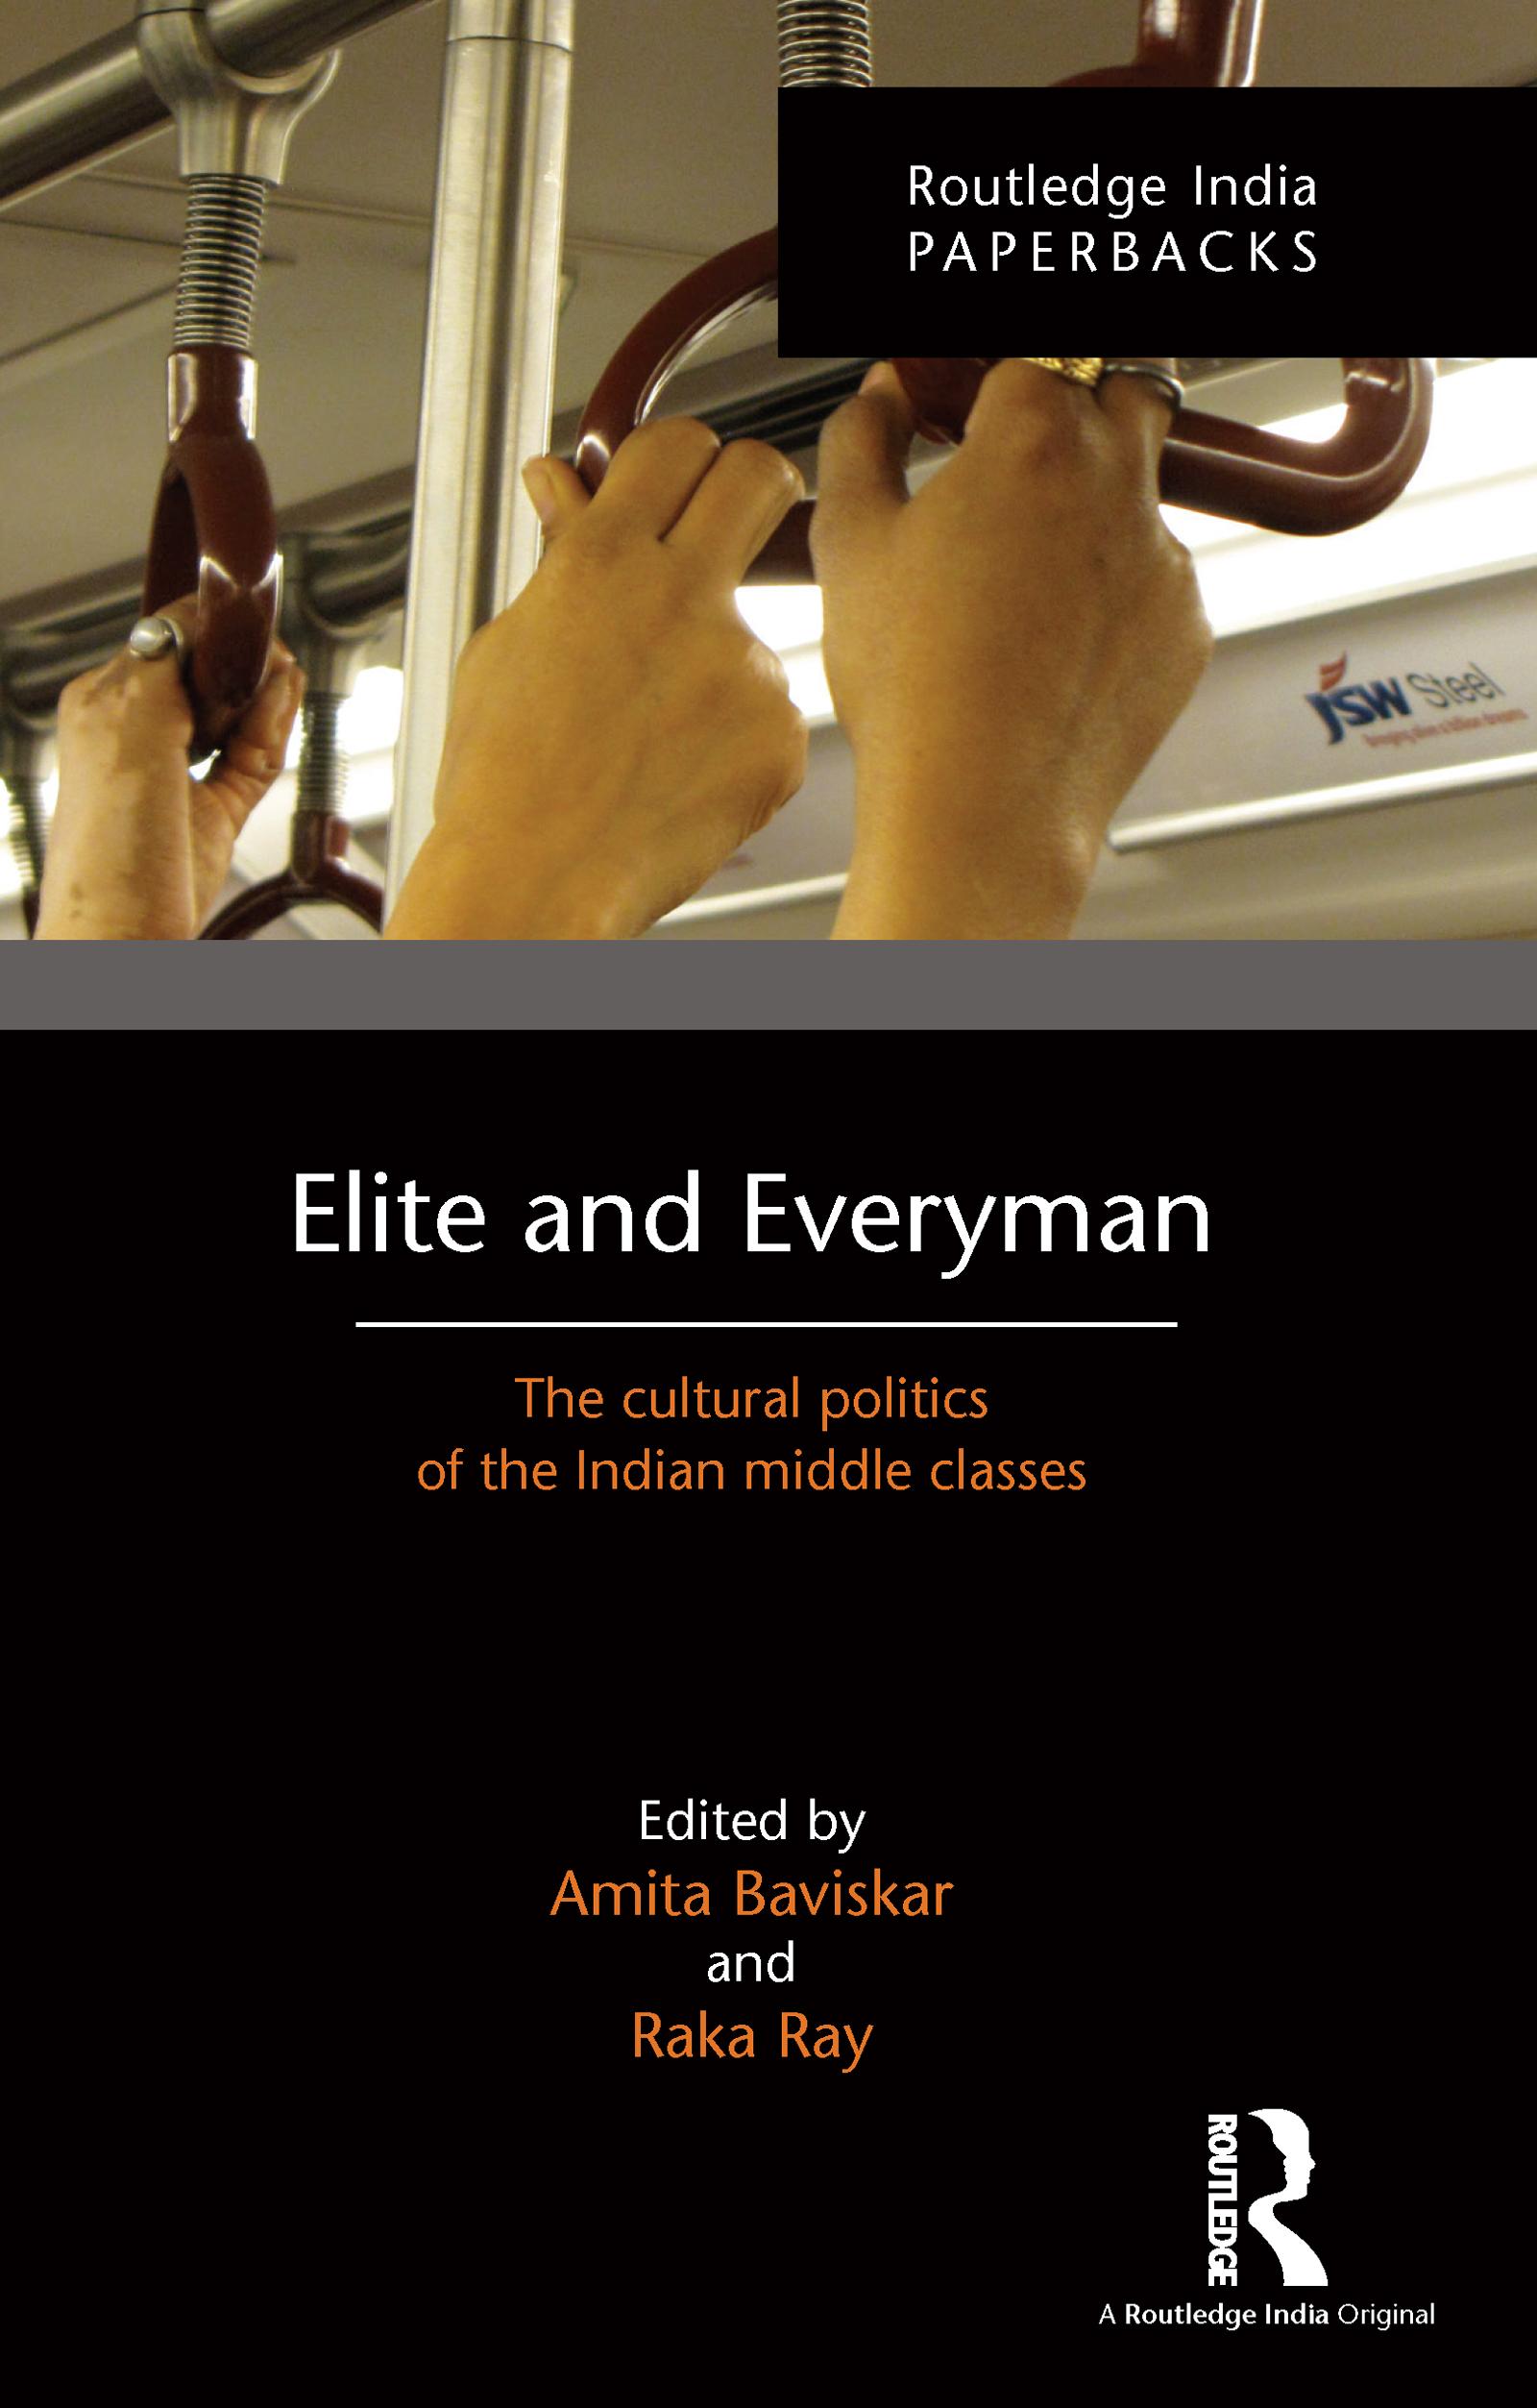 Elite and Everyman